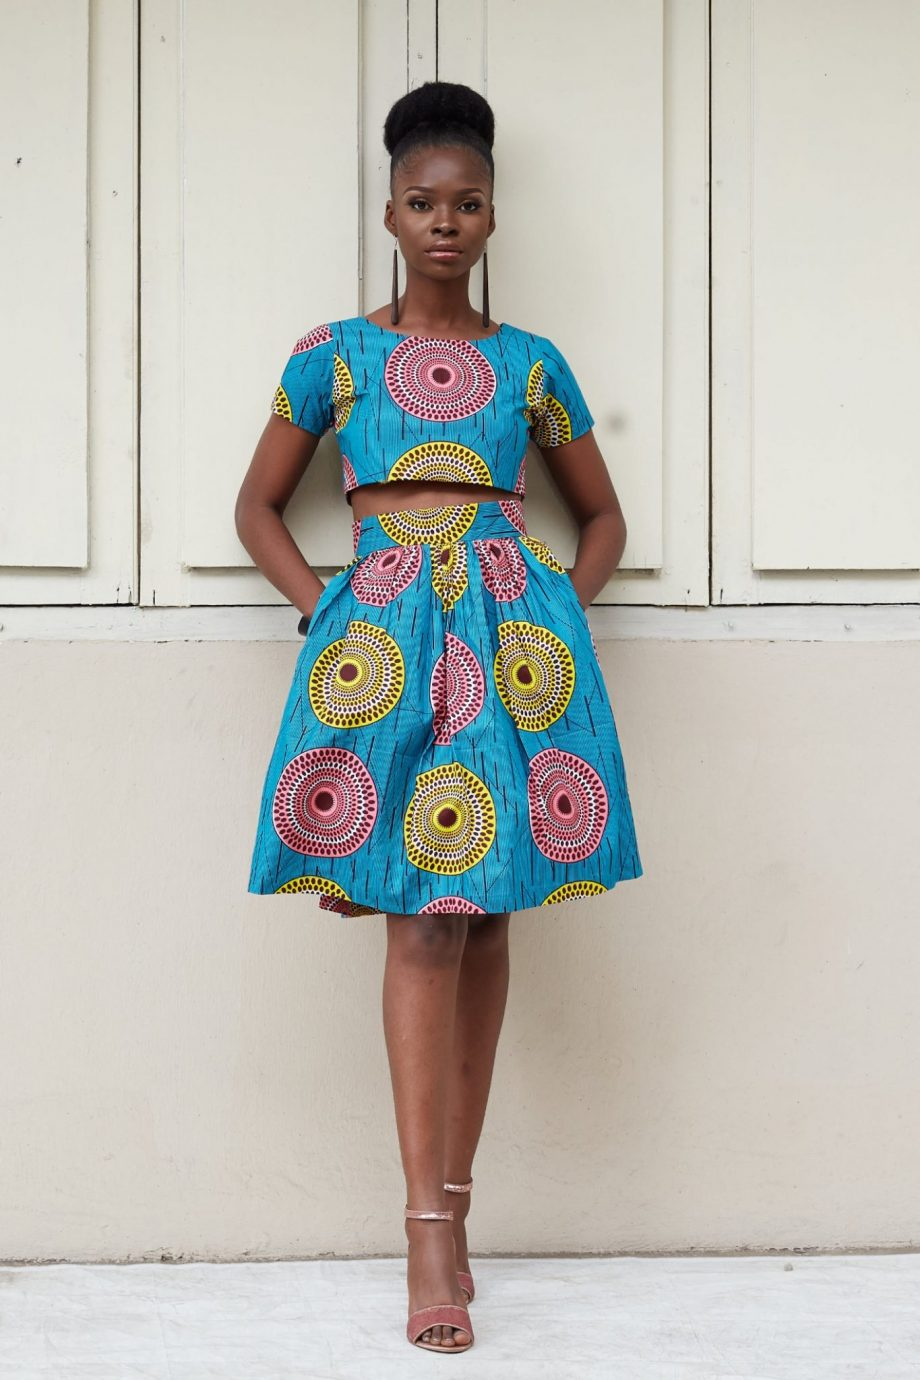 Zola African Print Crop Top And Skirt Set